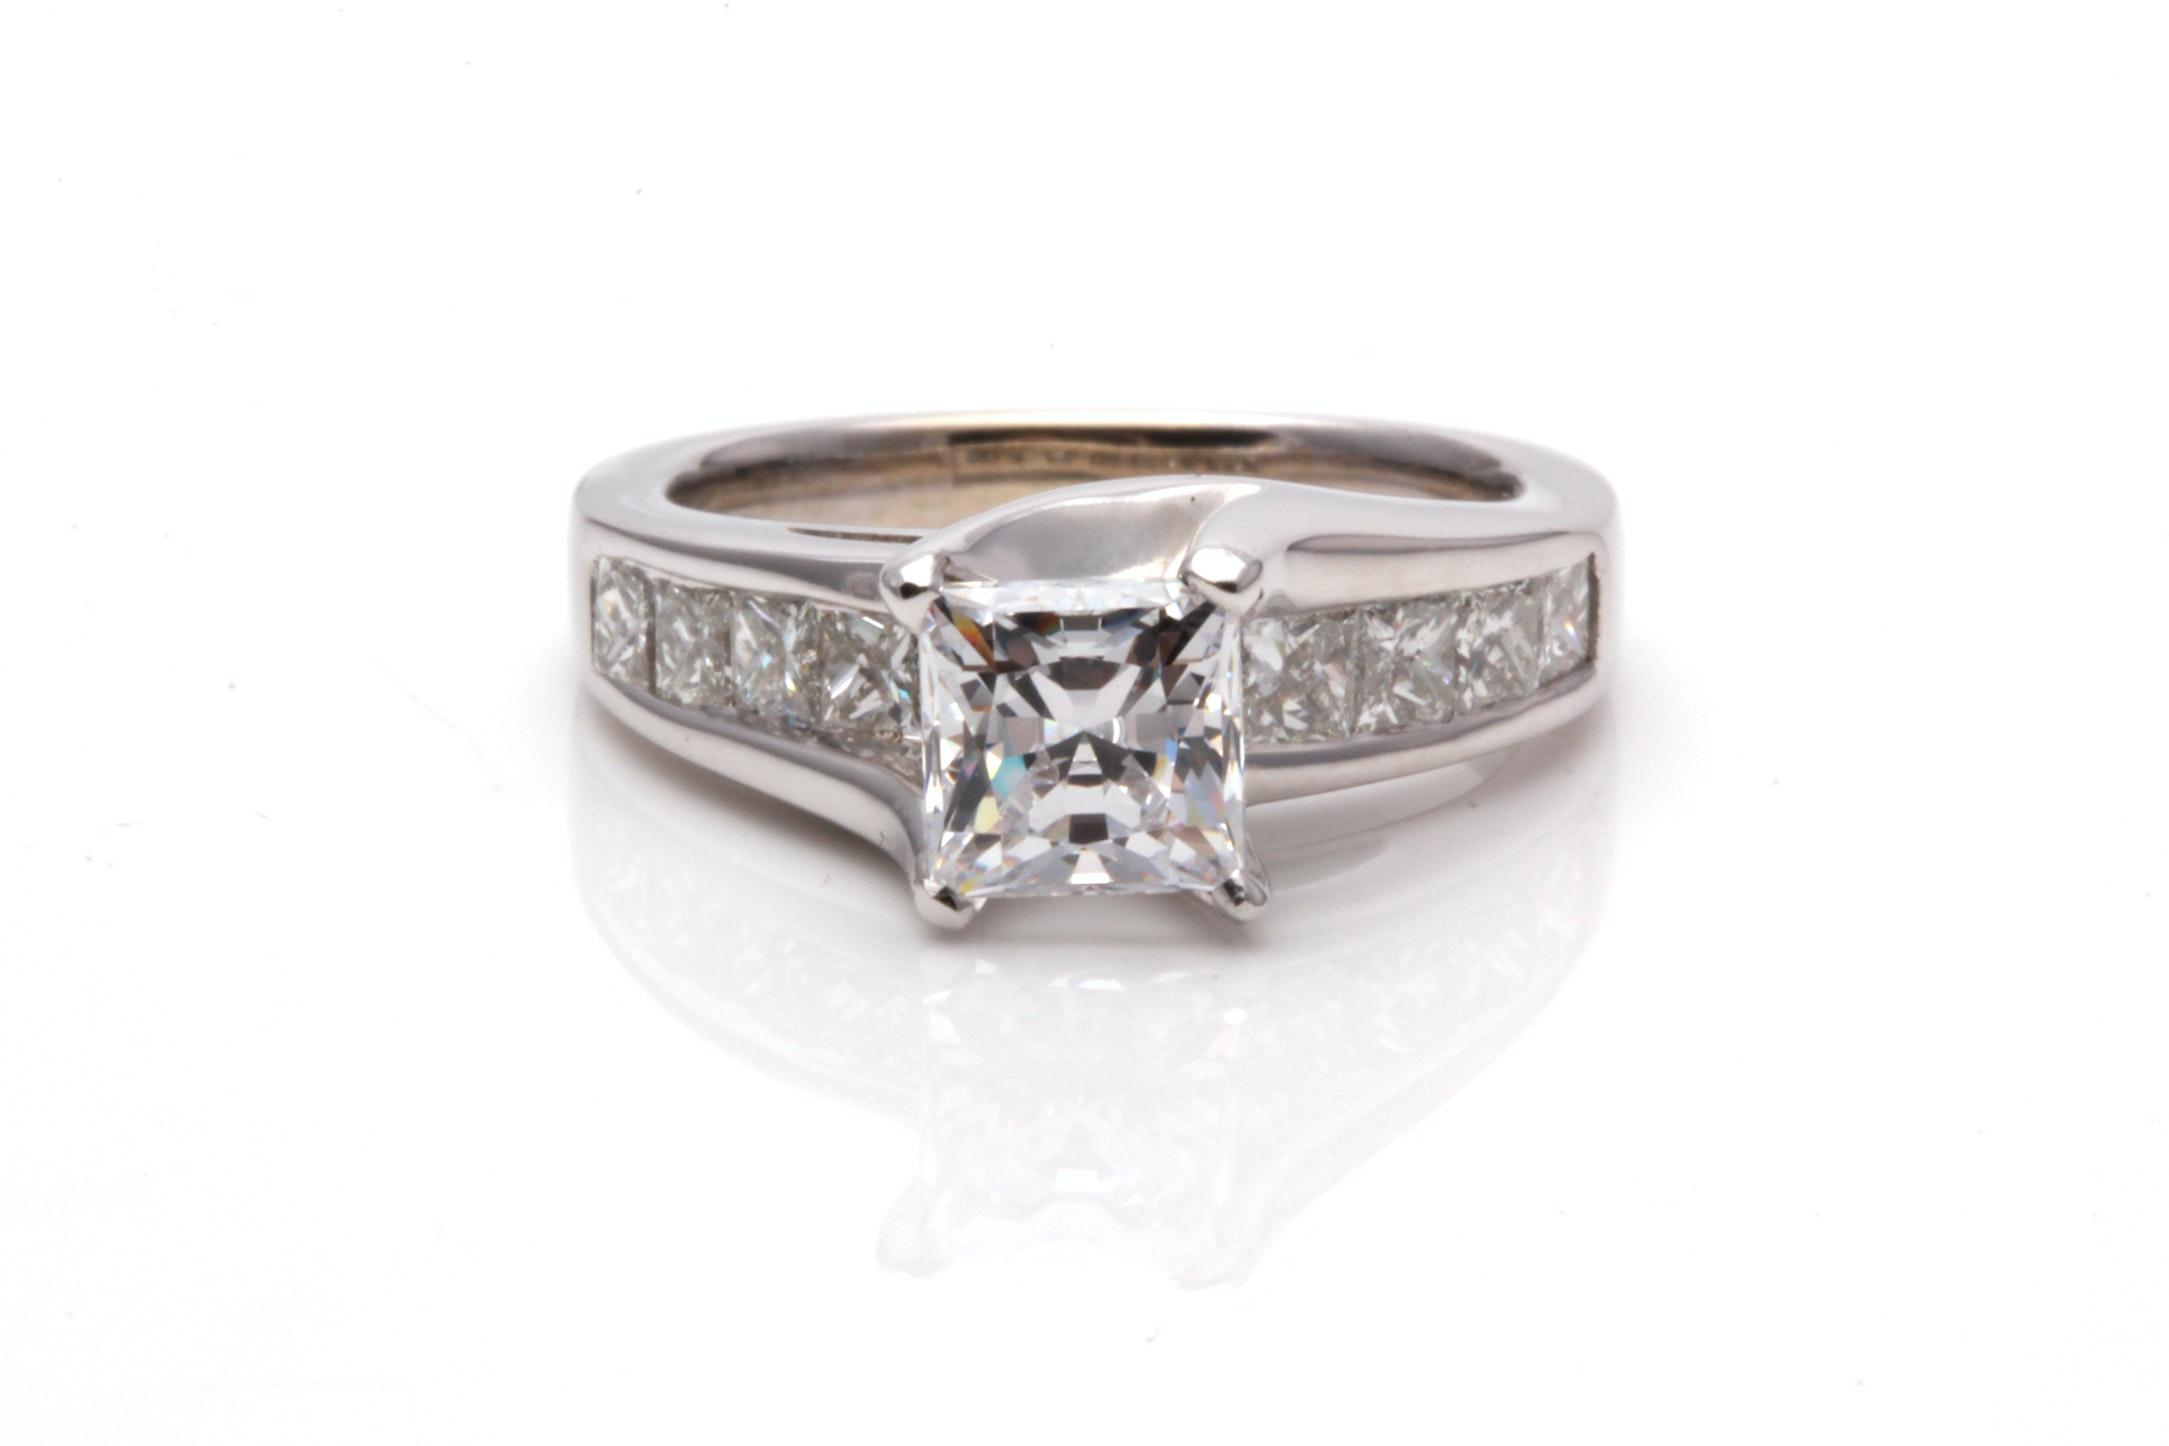 14K White Gold 1.05 CTW Diamond Semi-Mount Ring With Cubic Zirconia Center